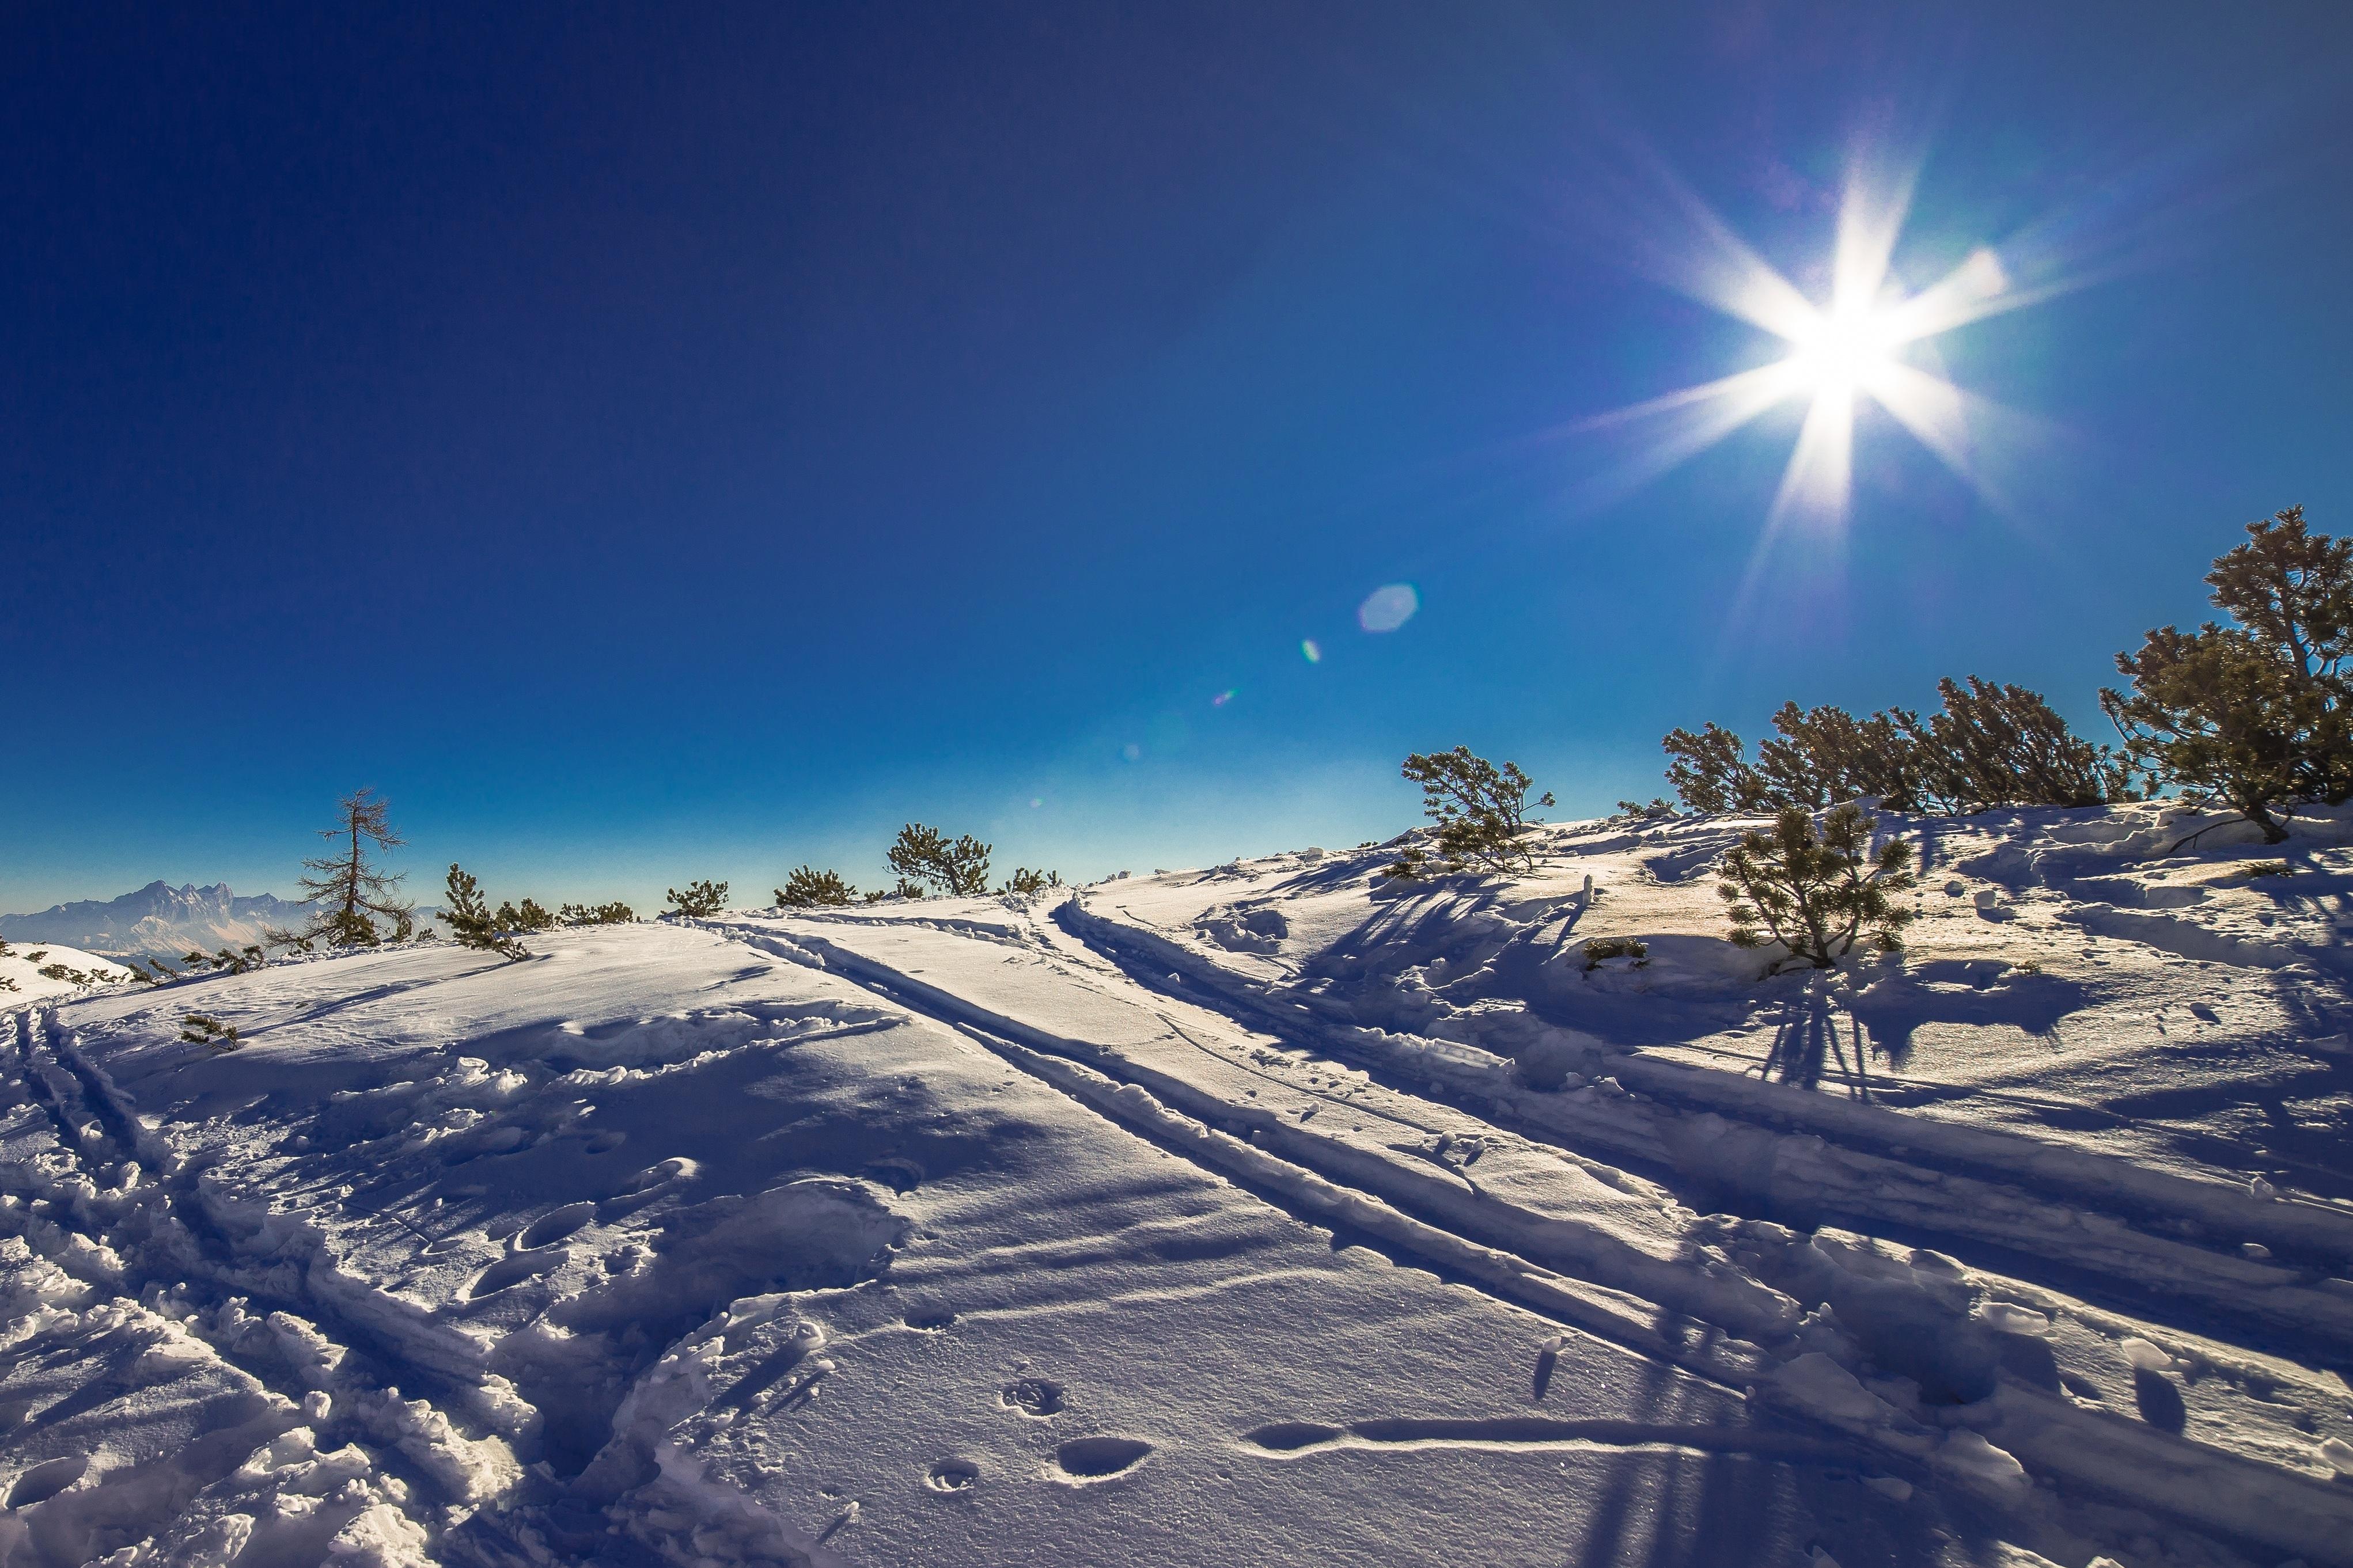 картинки на рабочий стол небо солнце снег дом